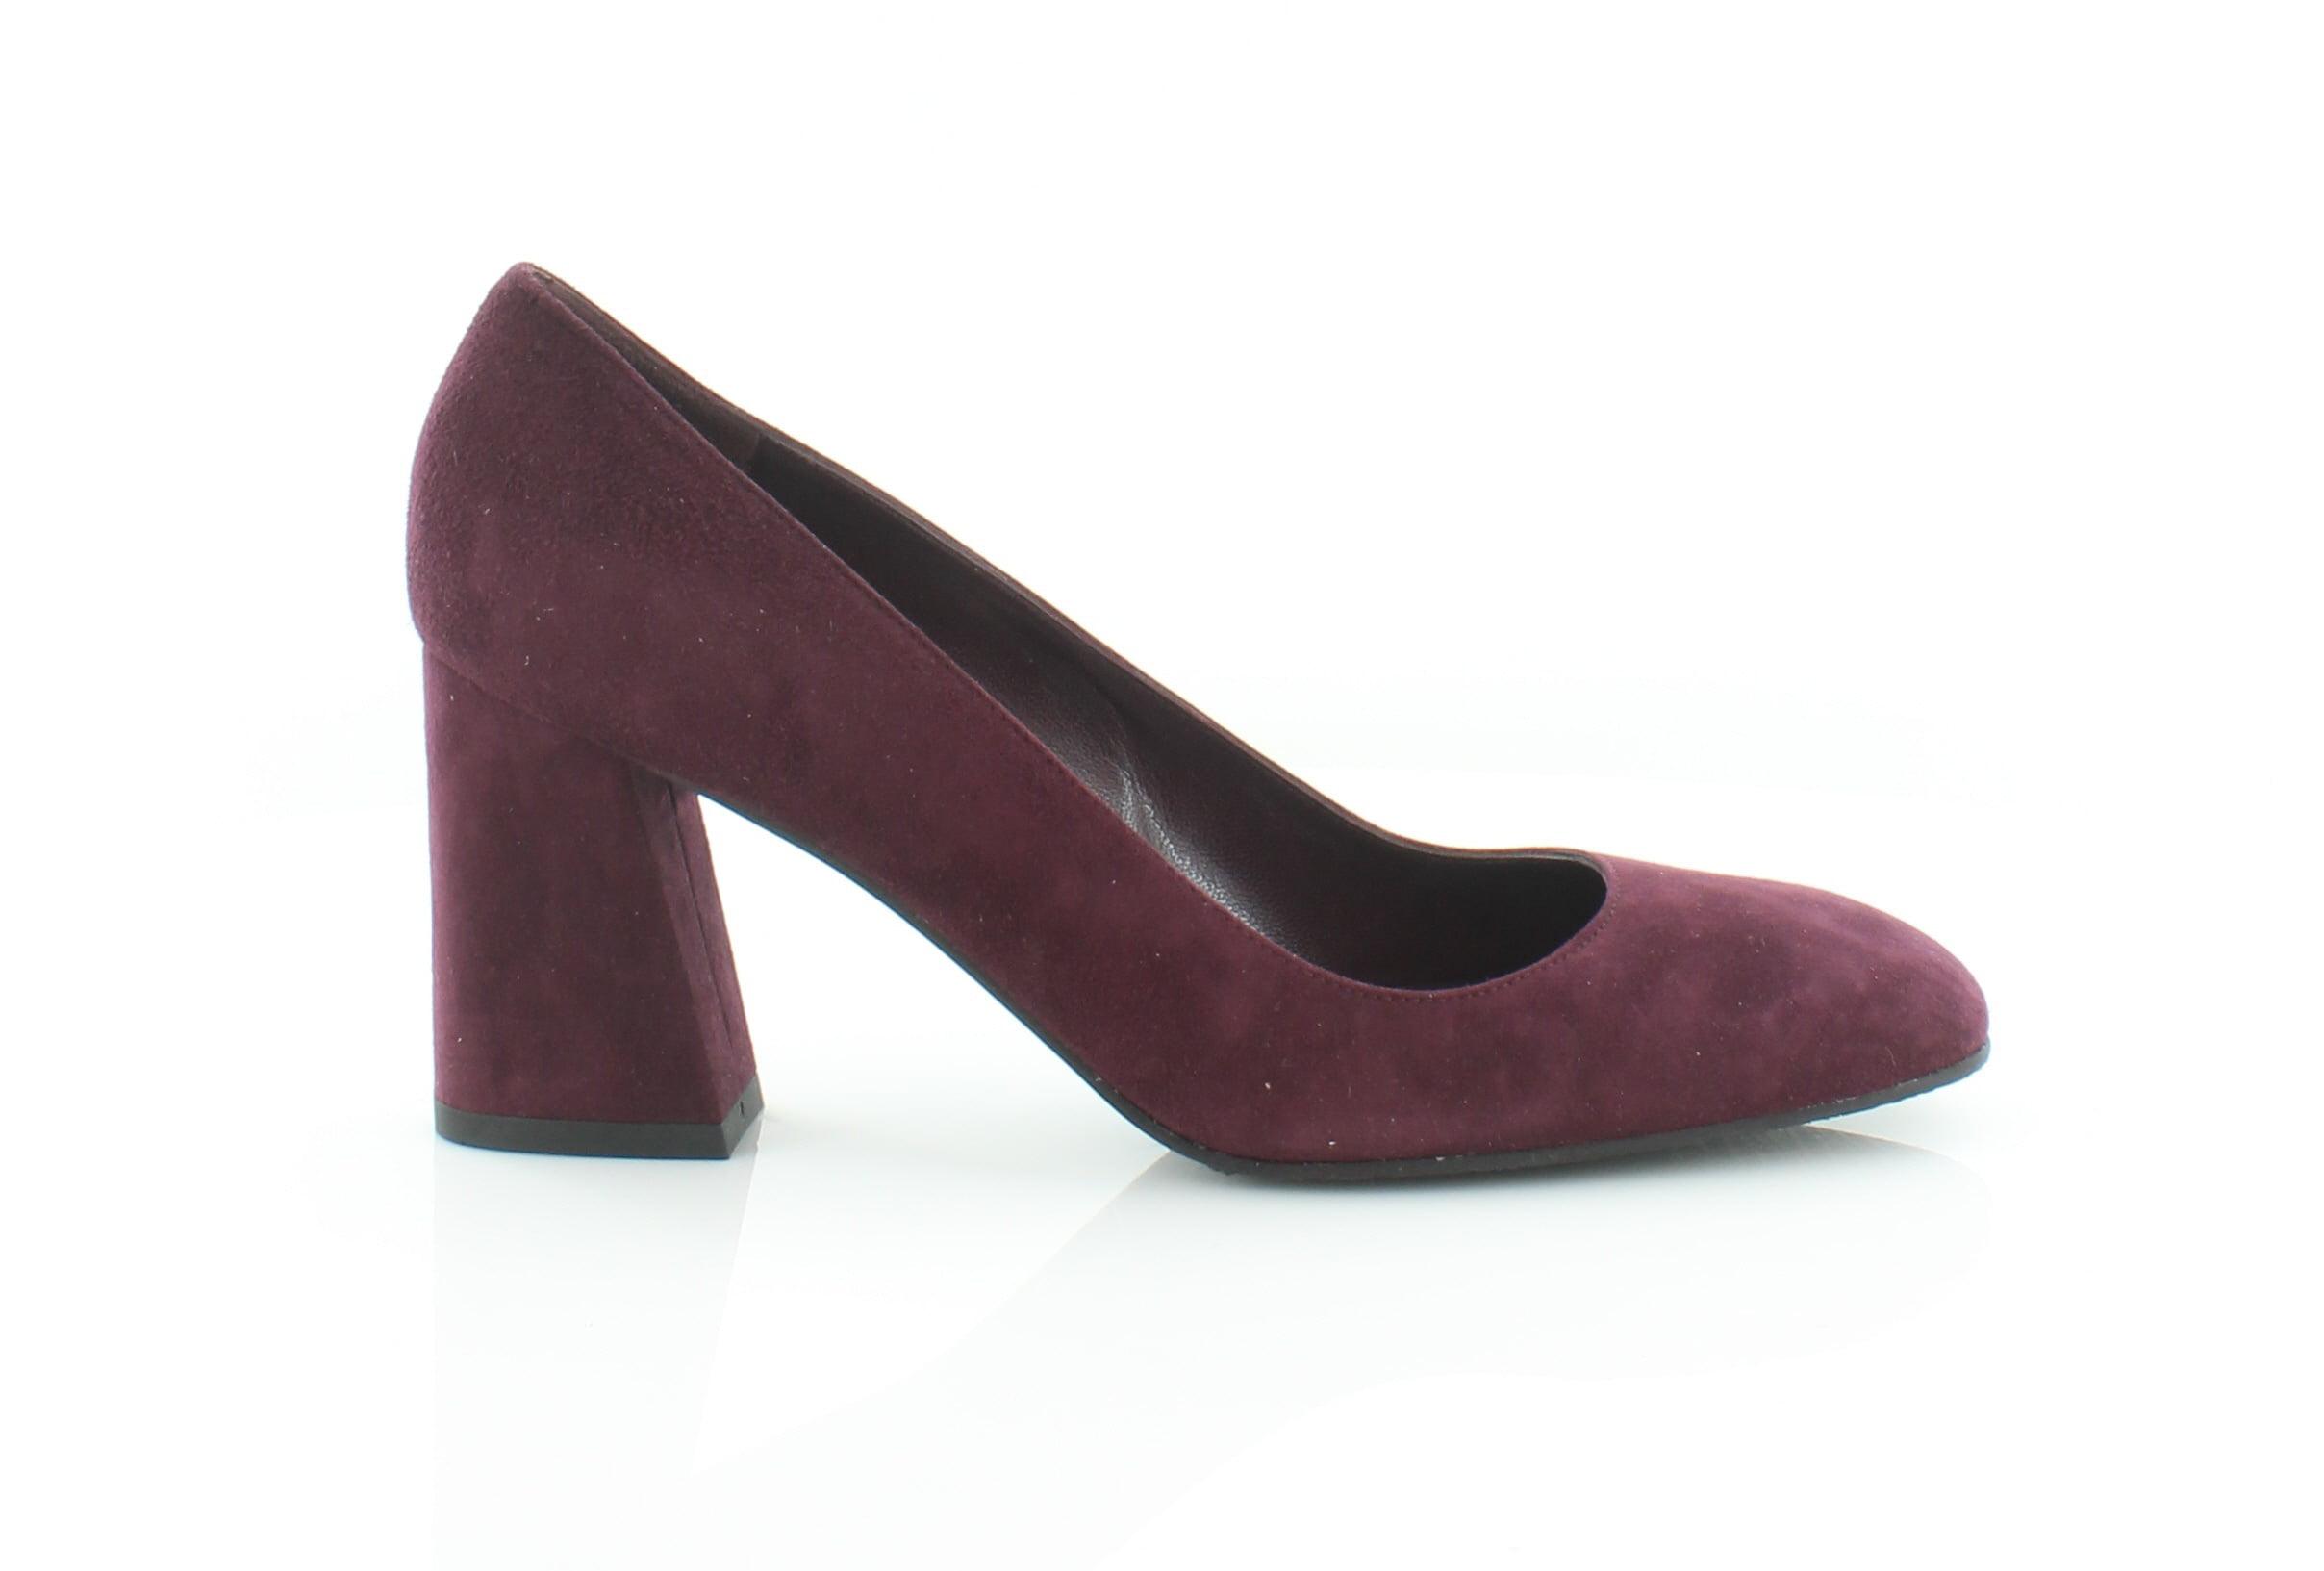 Stuart Weitzman Mary Women's Heels Burgundy Size 7.5 M